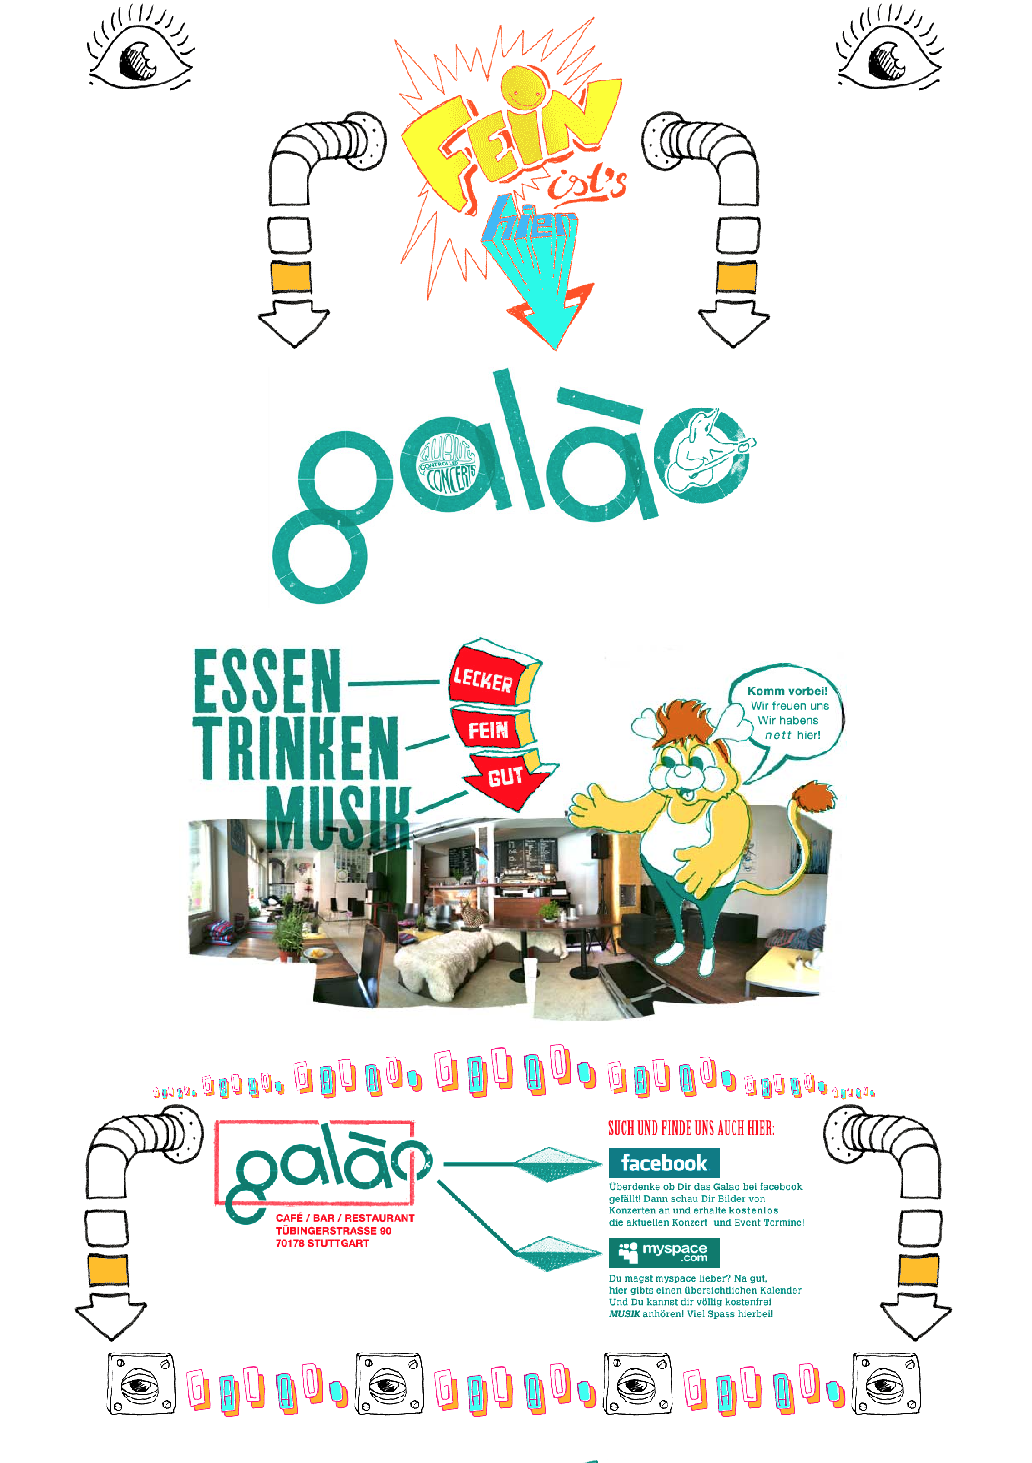 Kleon Medugorac Café Galao Homepage